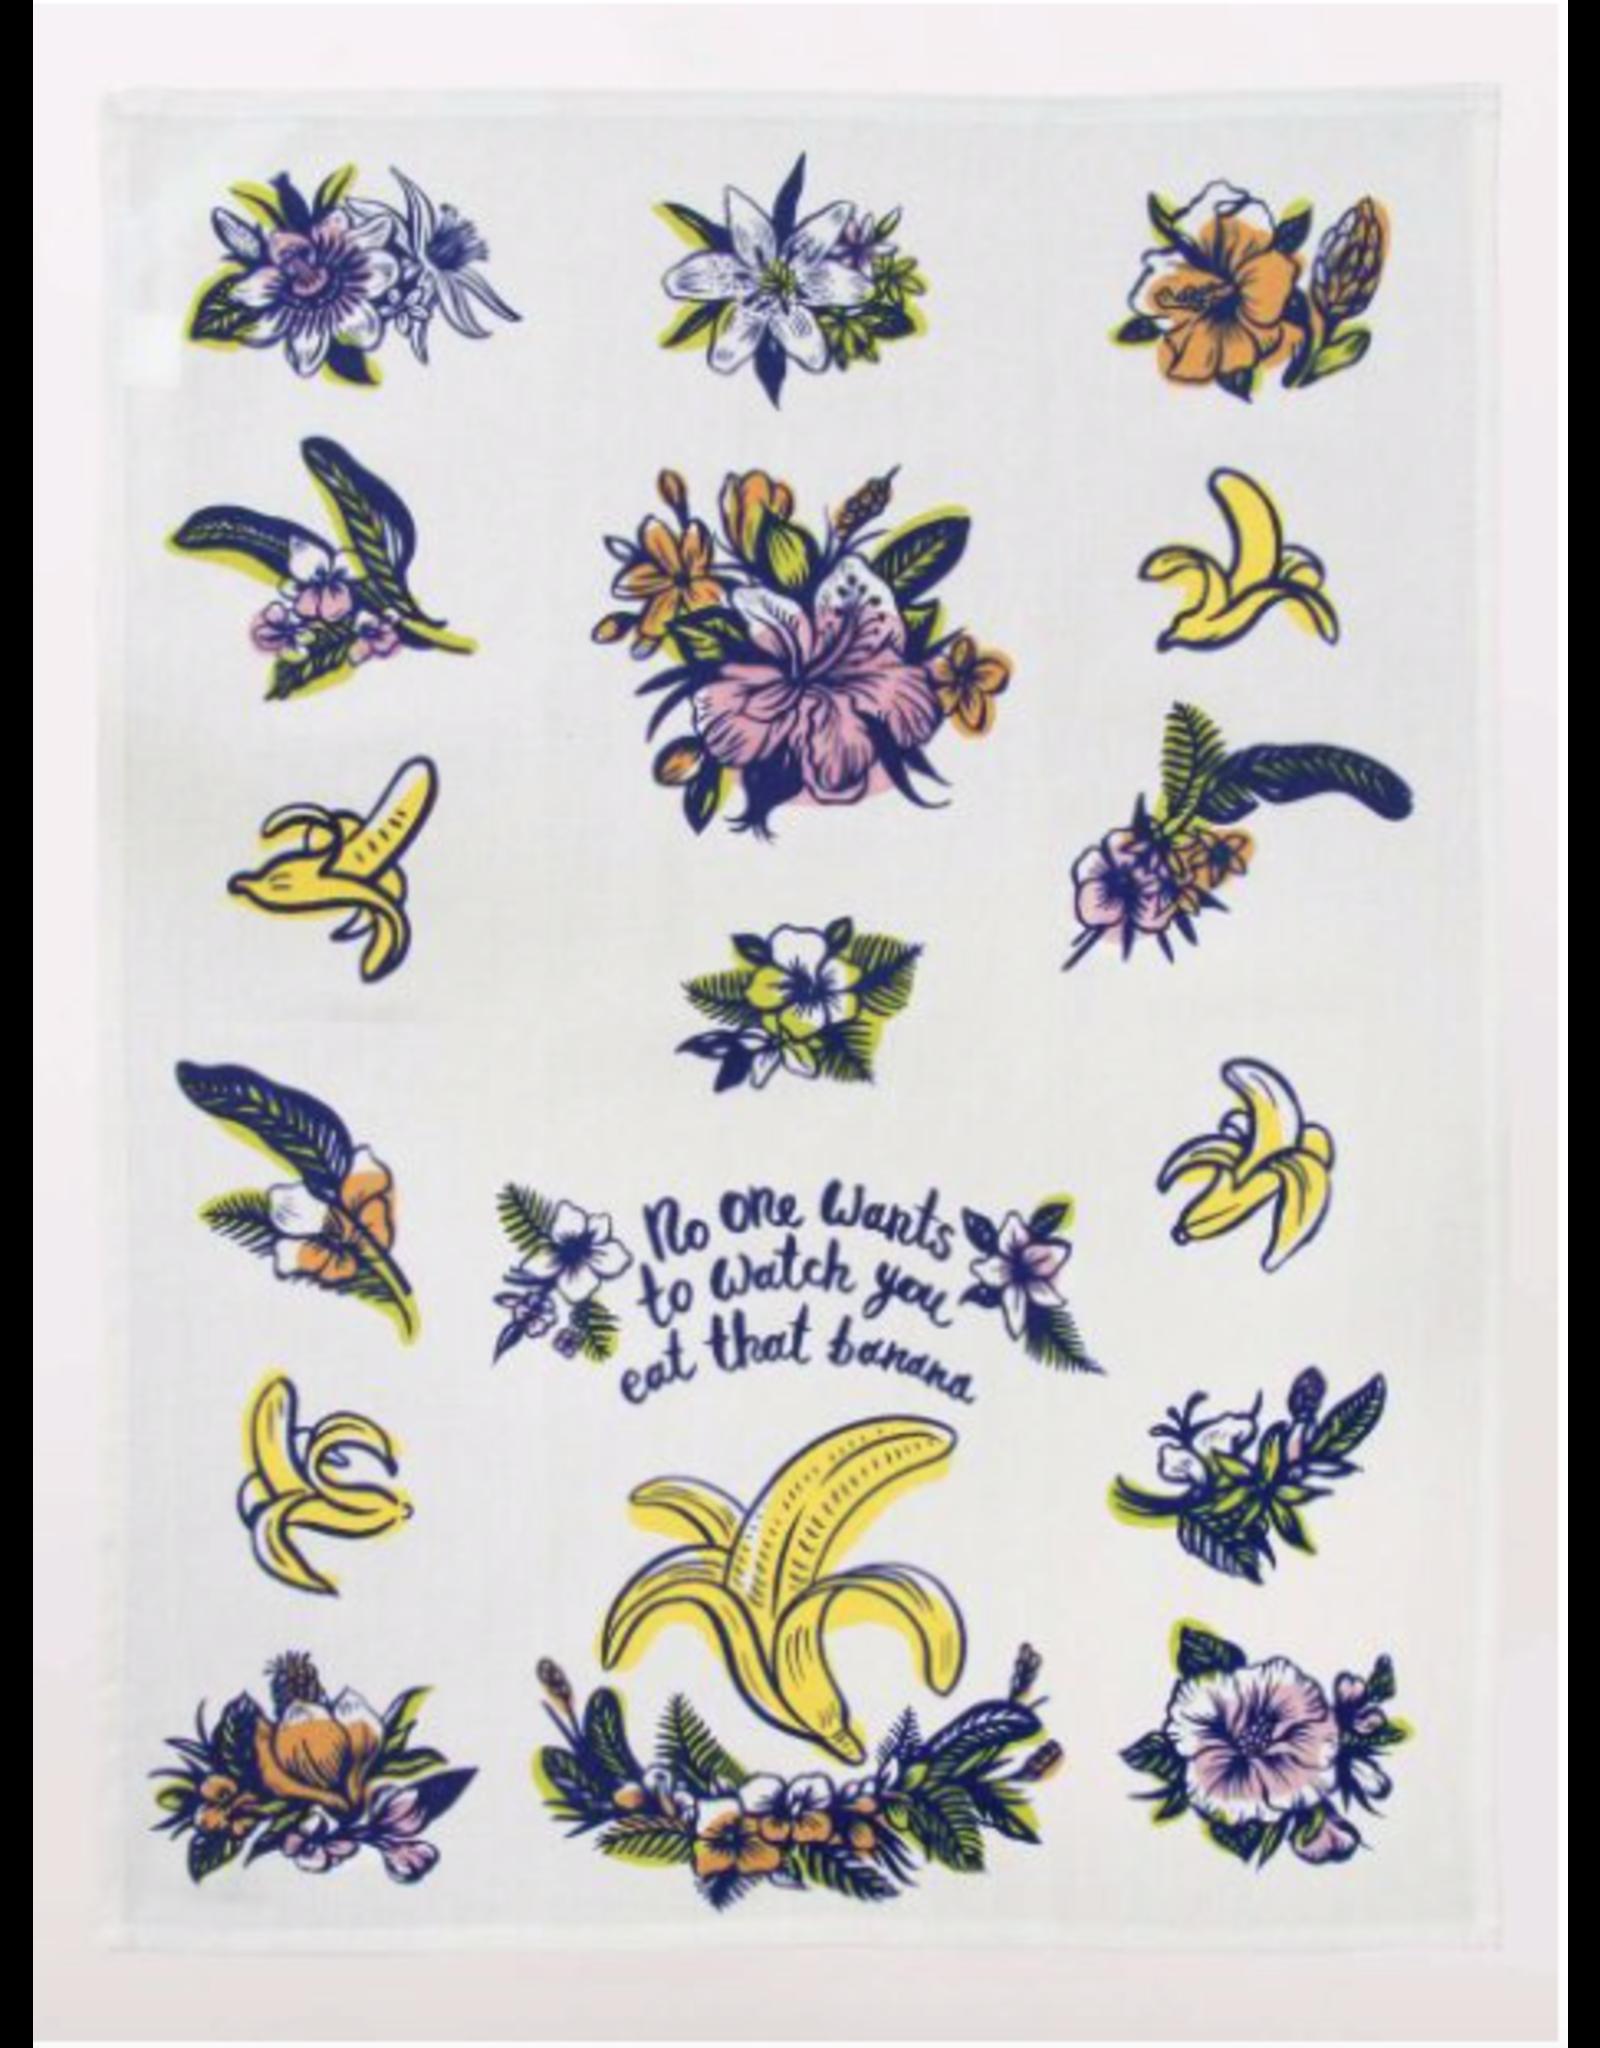 Blue Q Blue Q - Eat that Banana dish towel